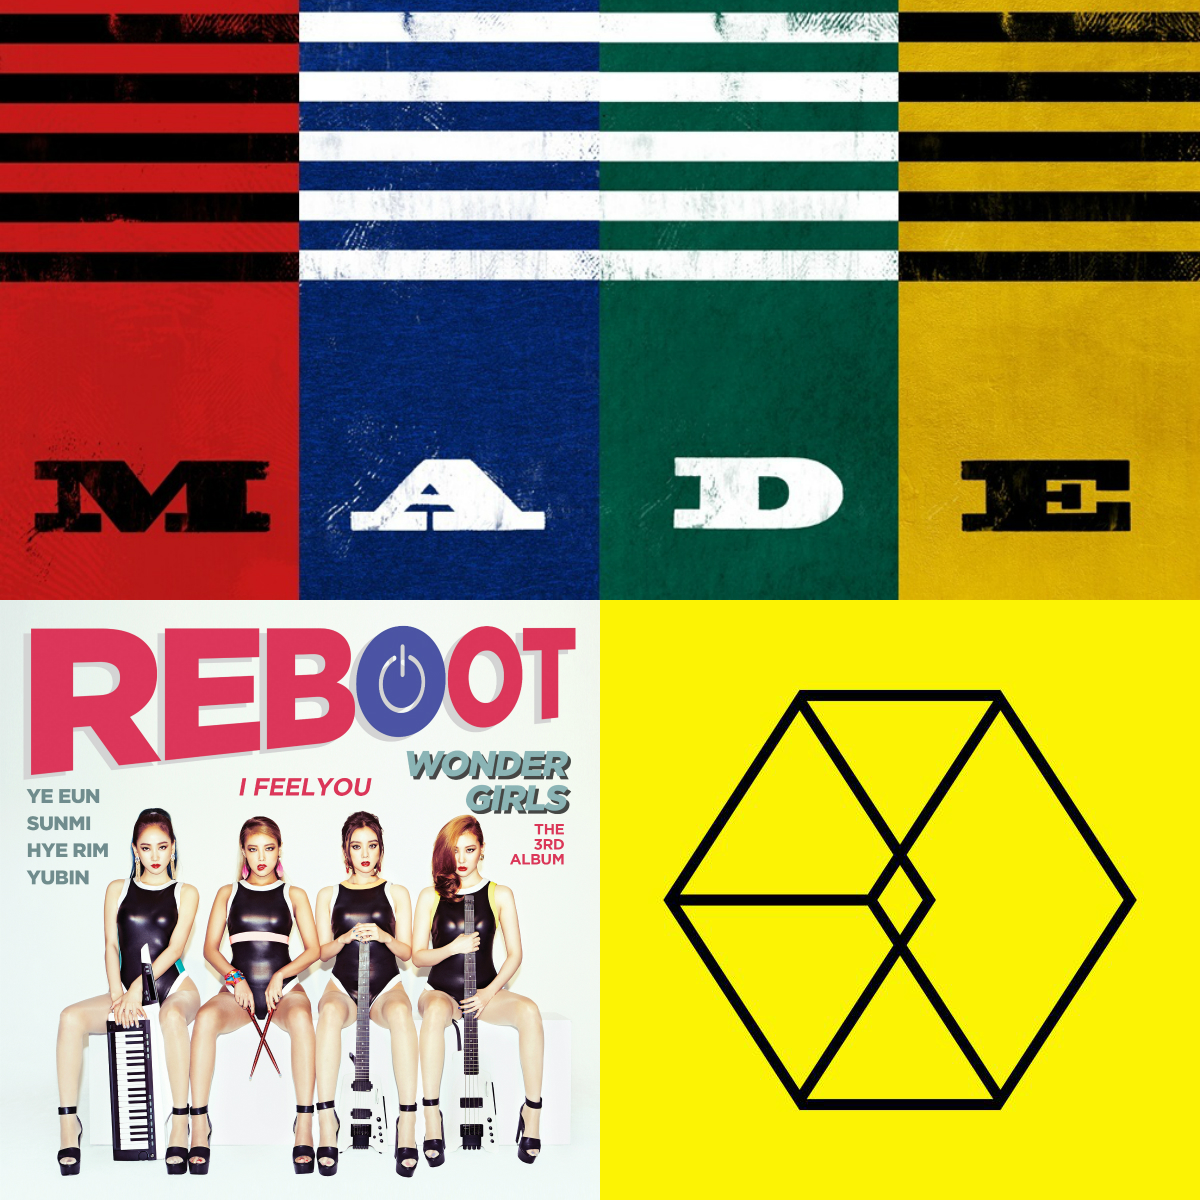 Best K-pop albums main